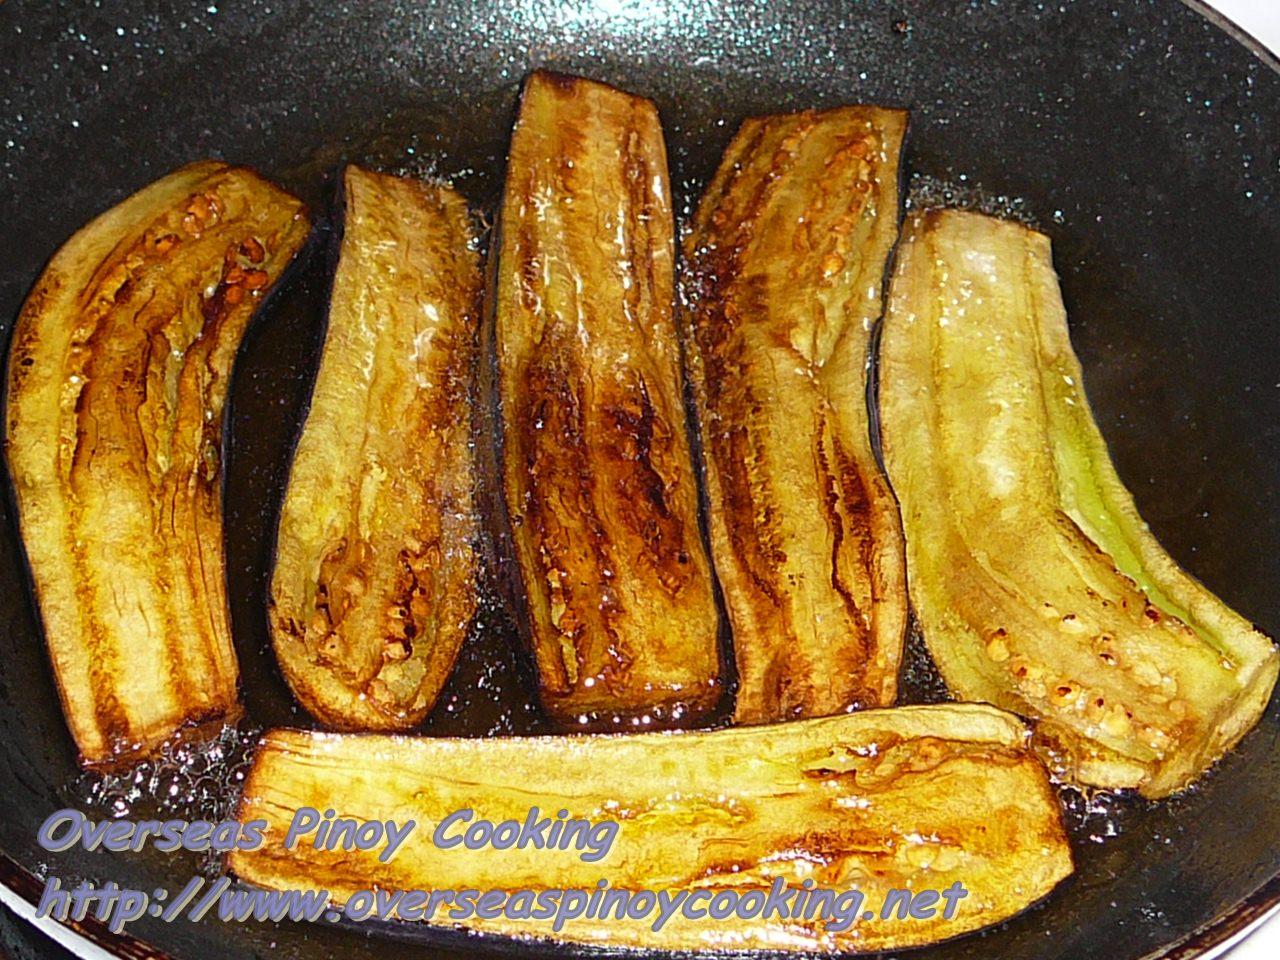 Pritong Talong Pinoy Fried Eggplant